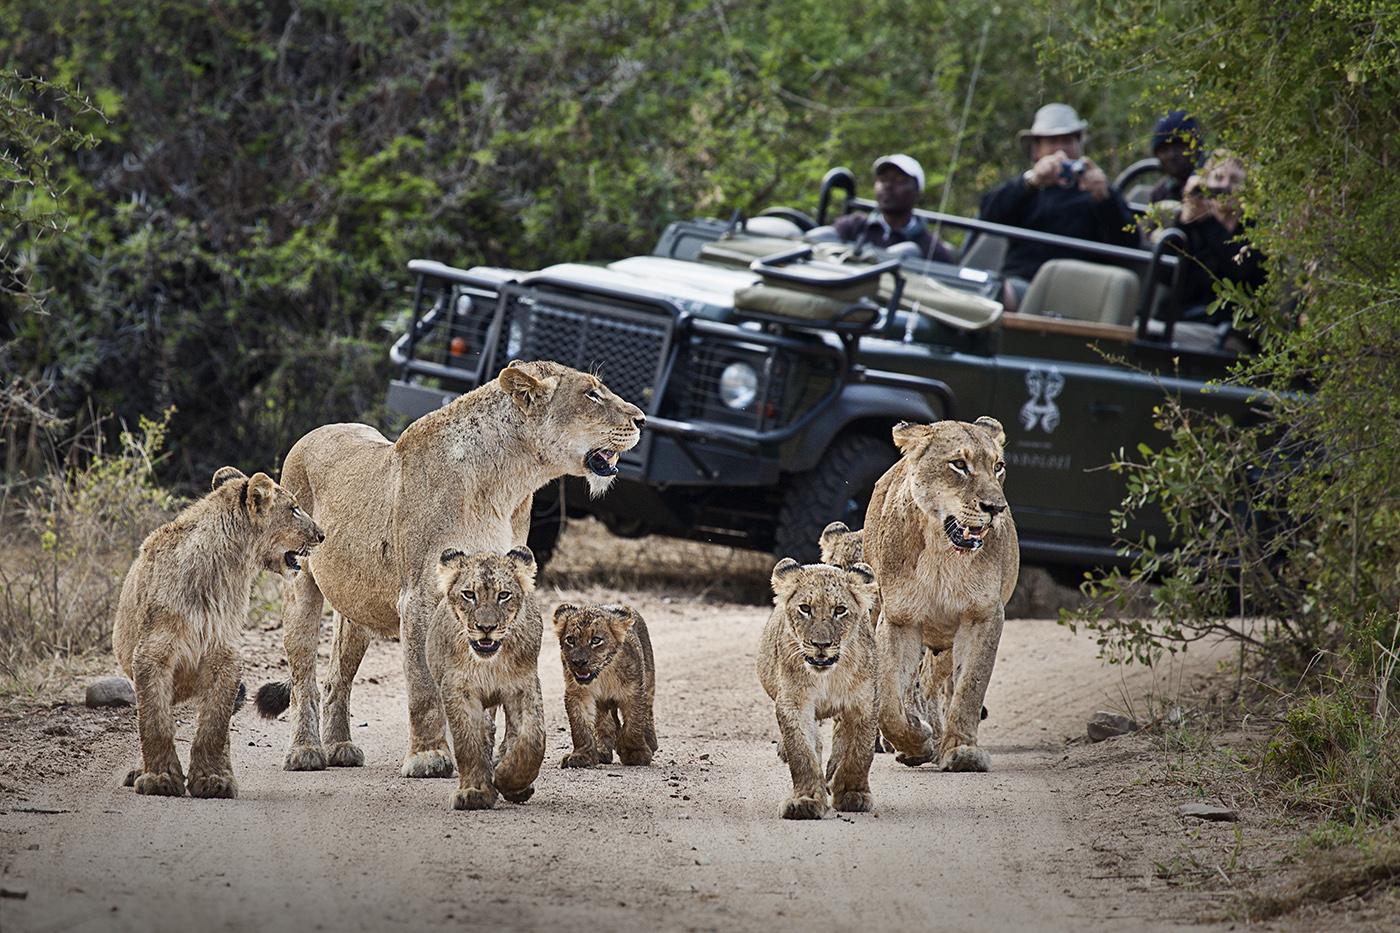 Tsalala Cubs and VehicleSMALL